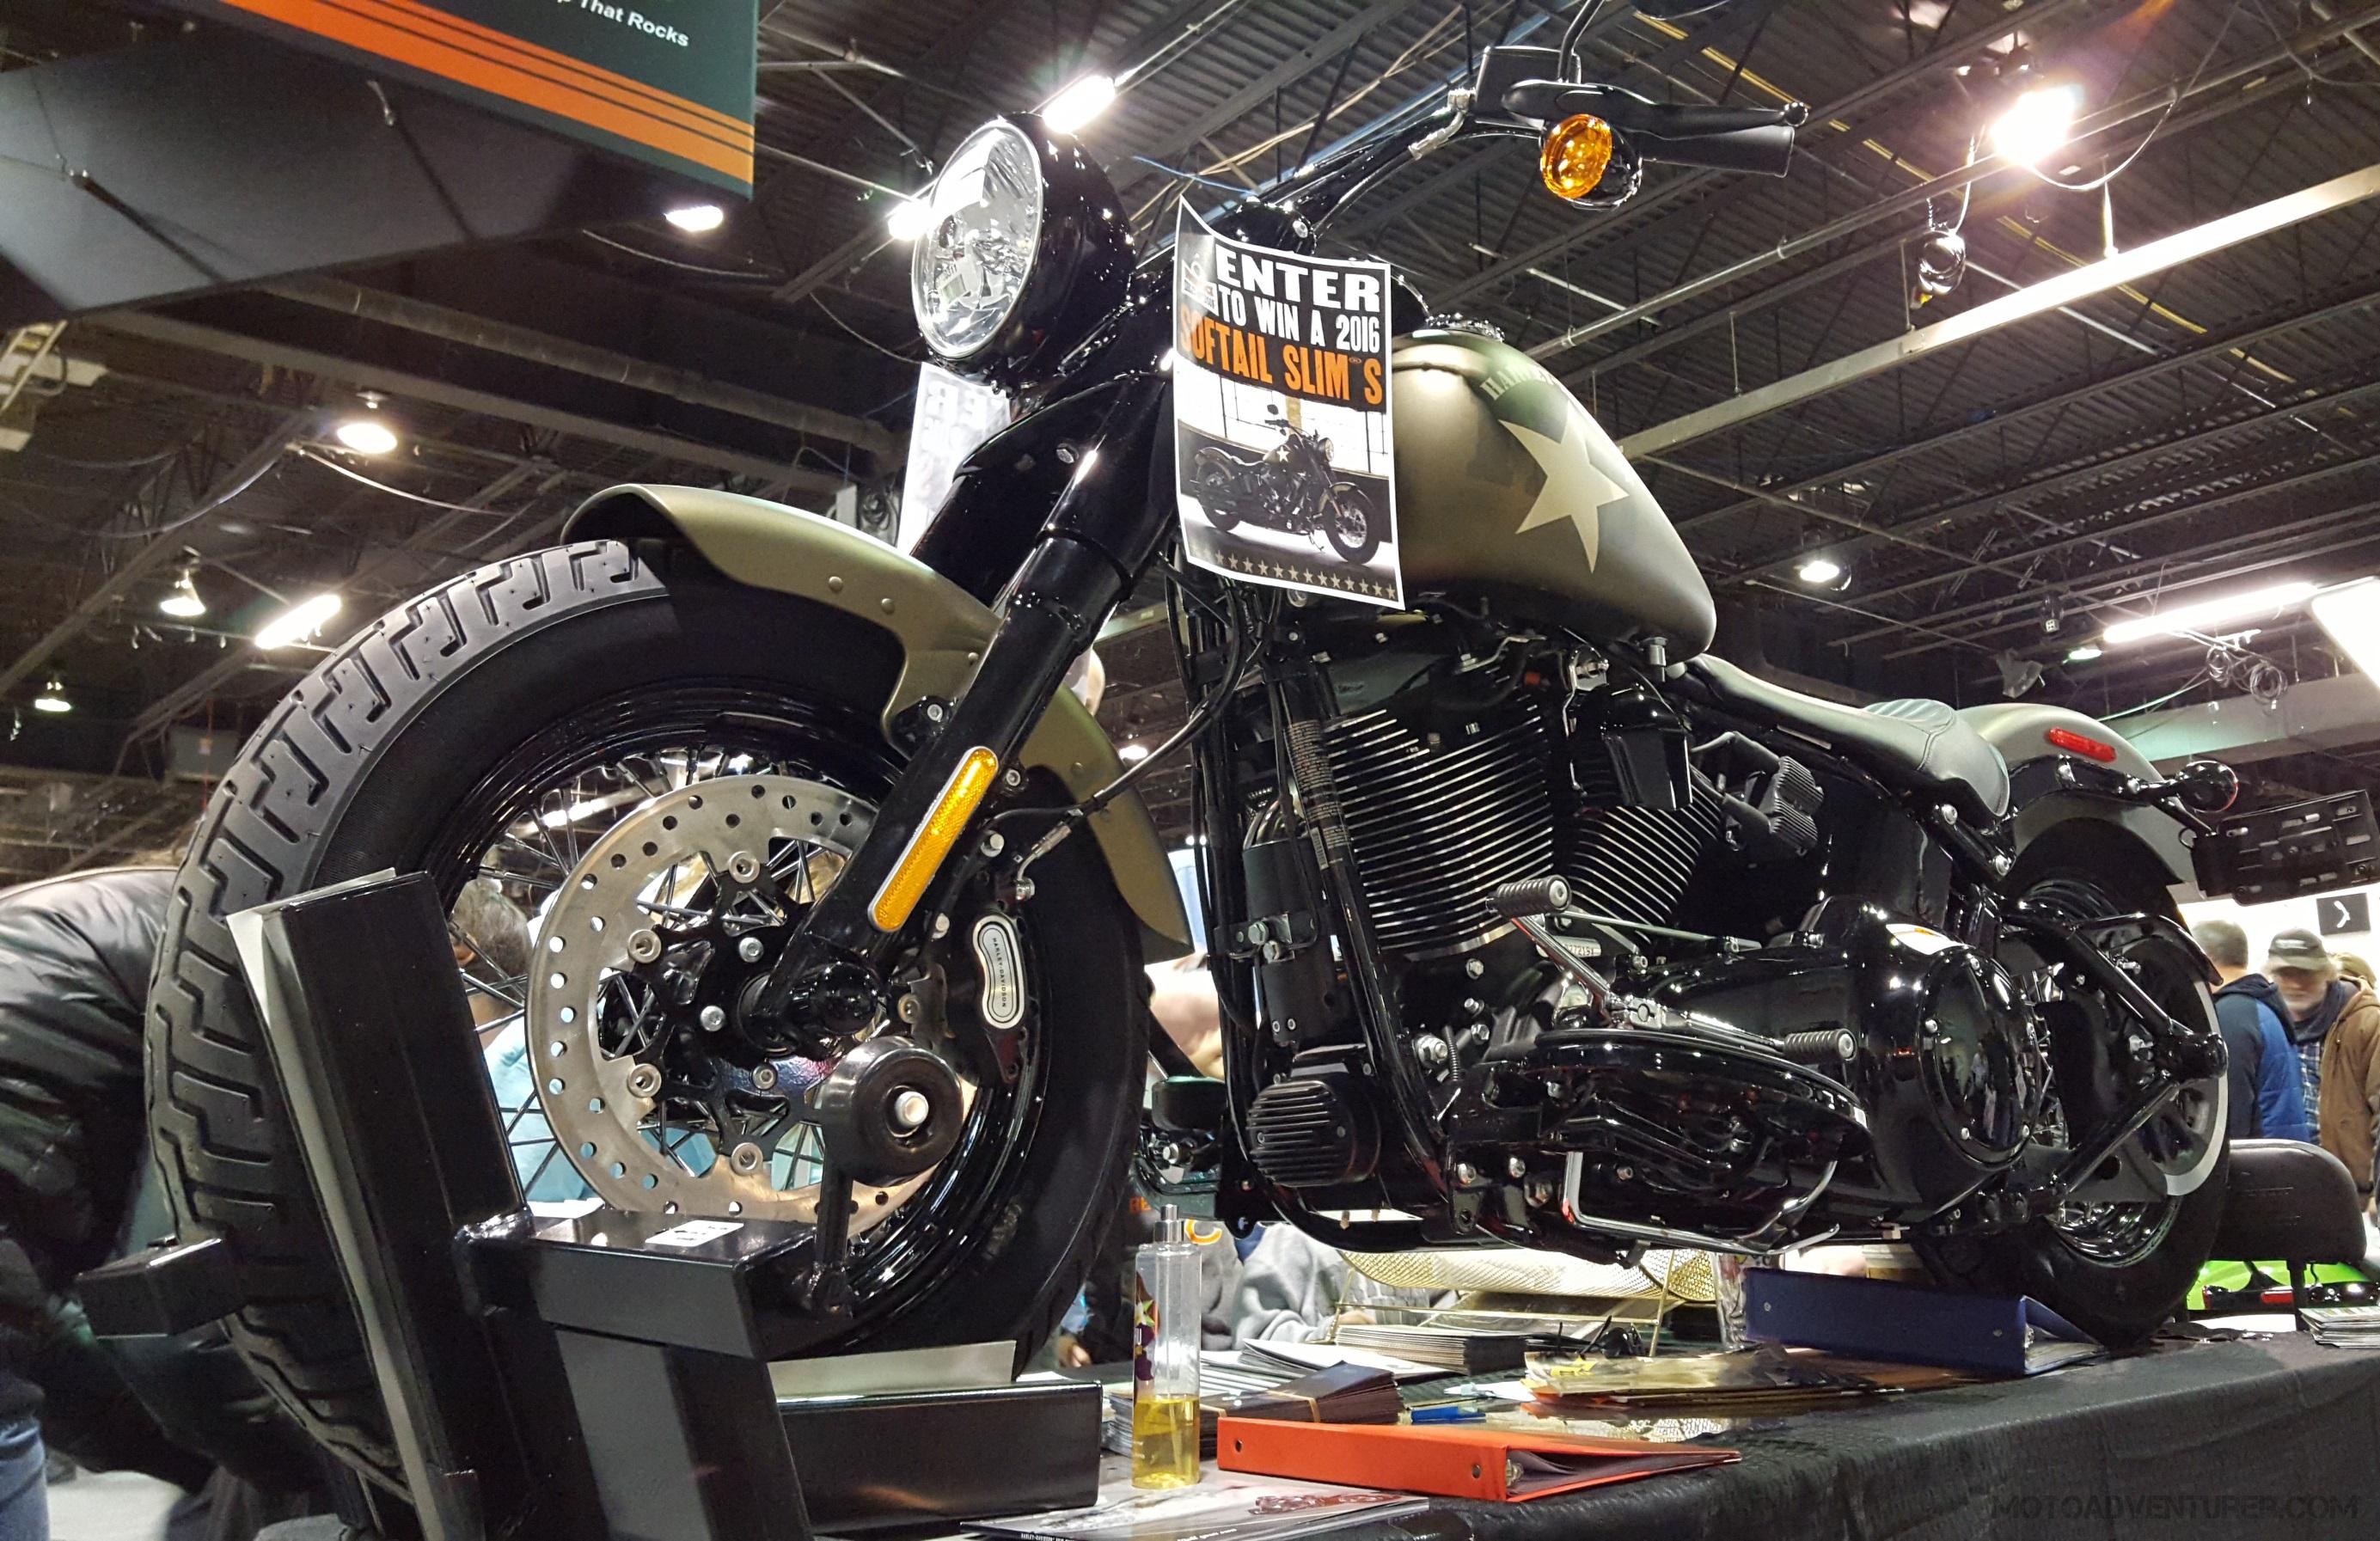 progressive international motorcycle show, chicago: harley